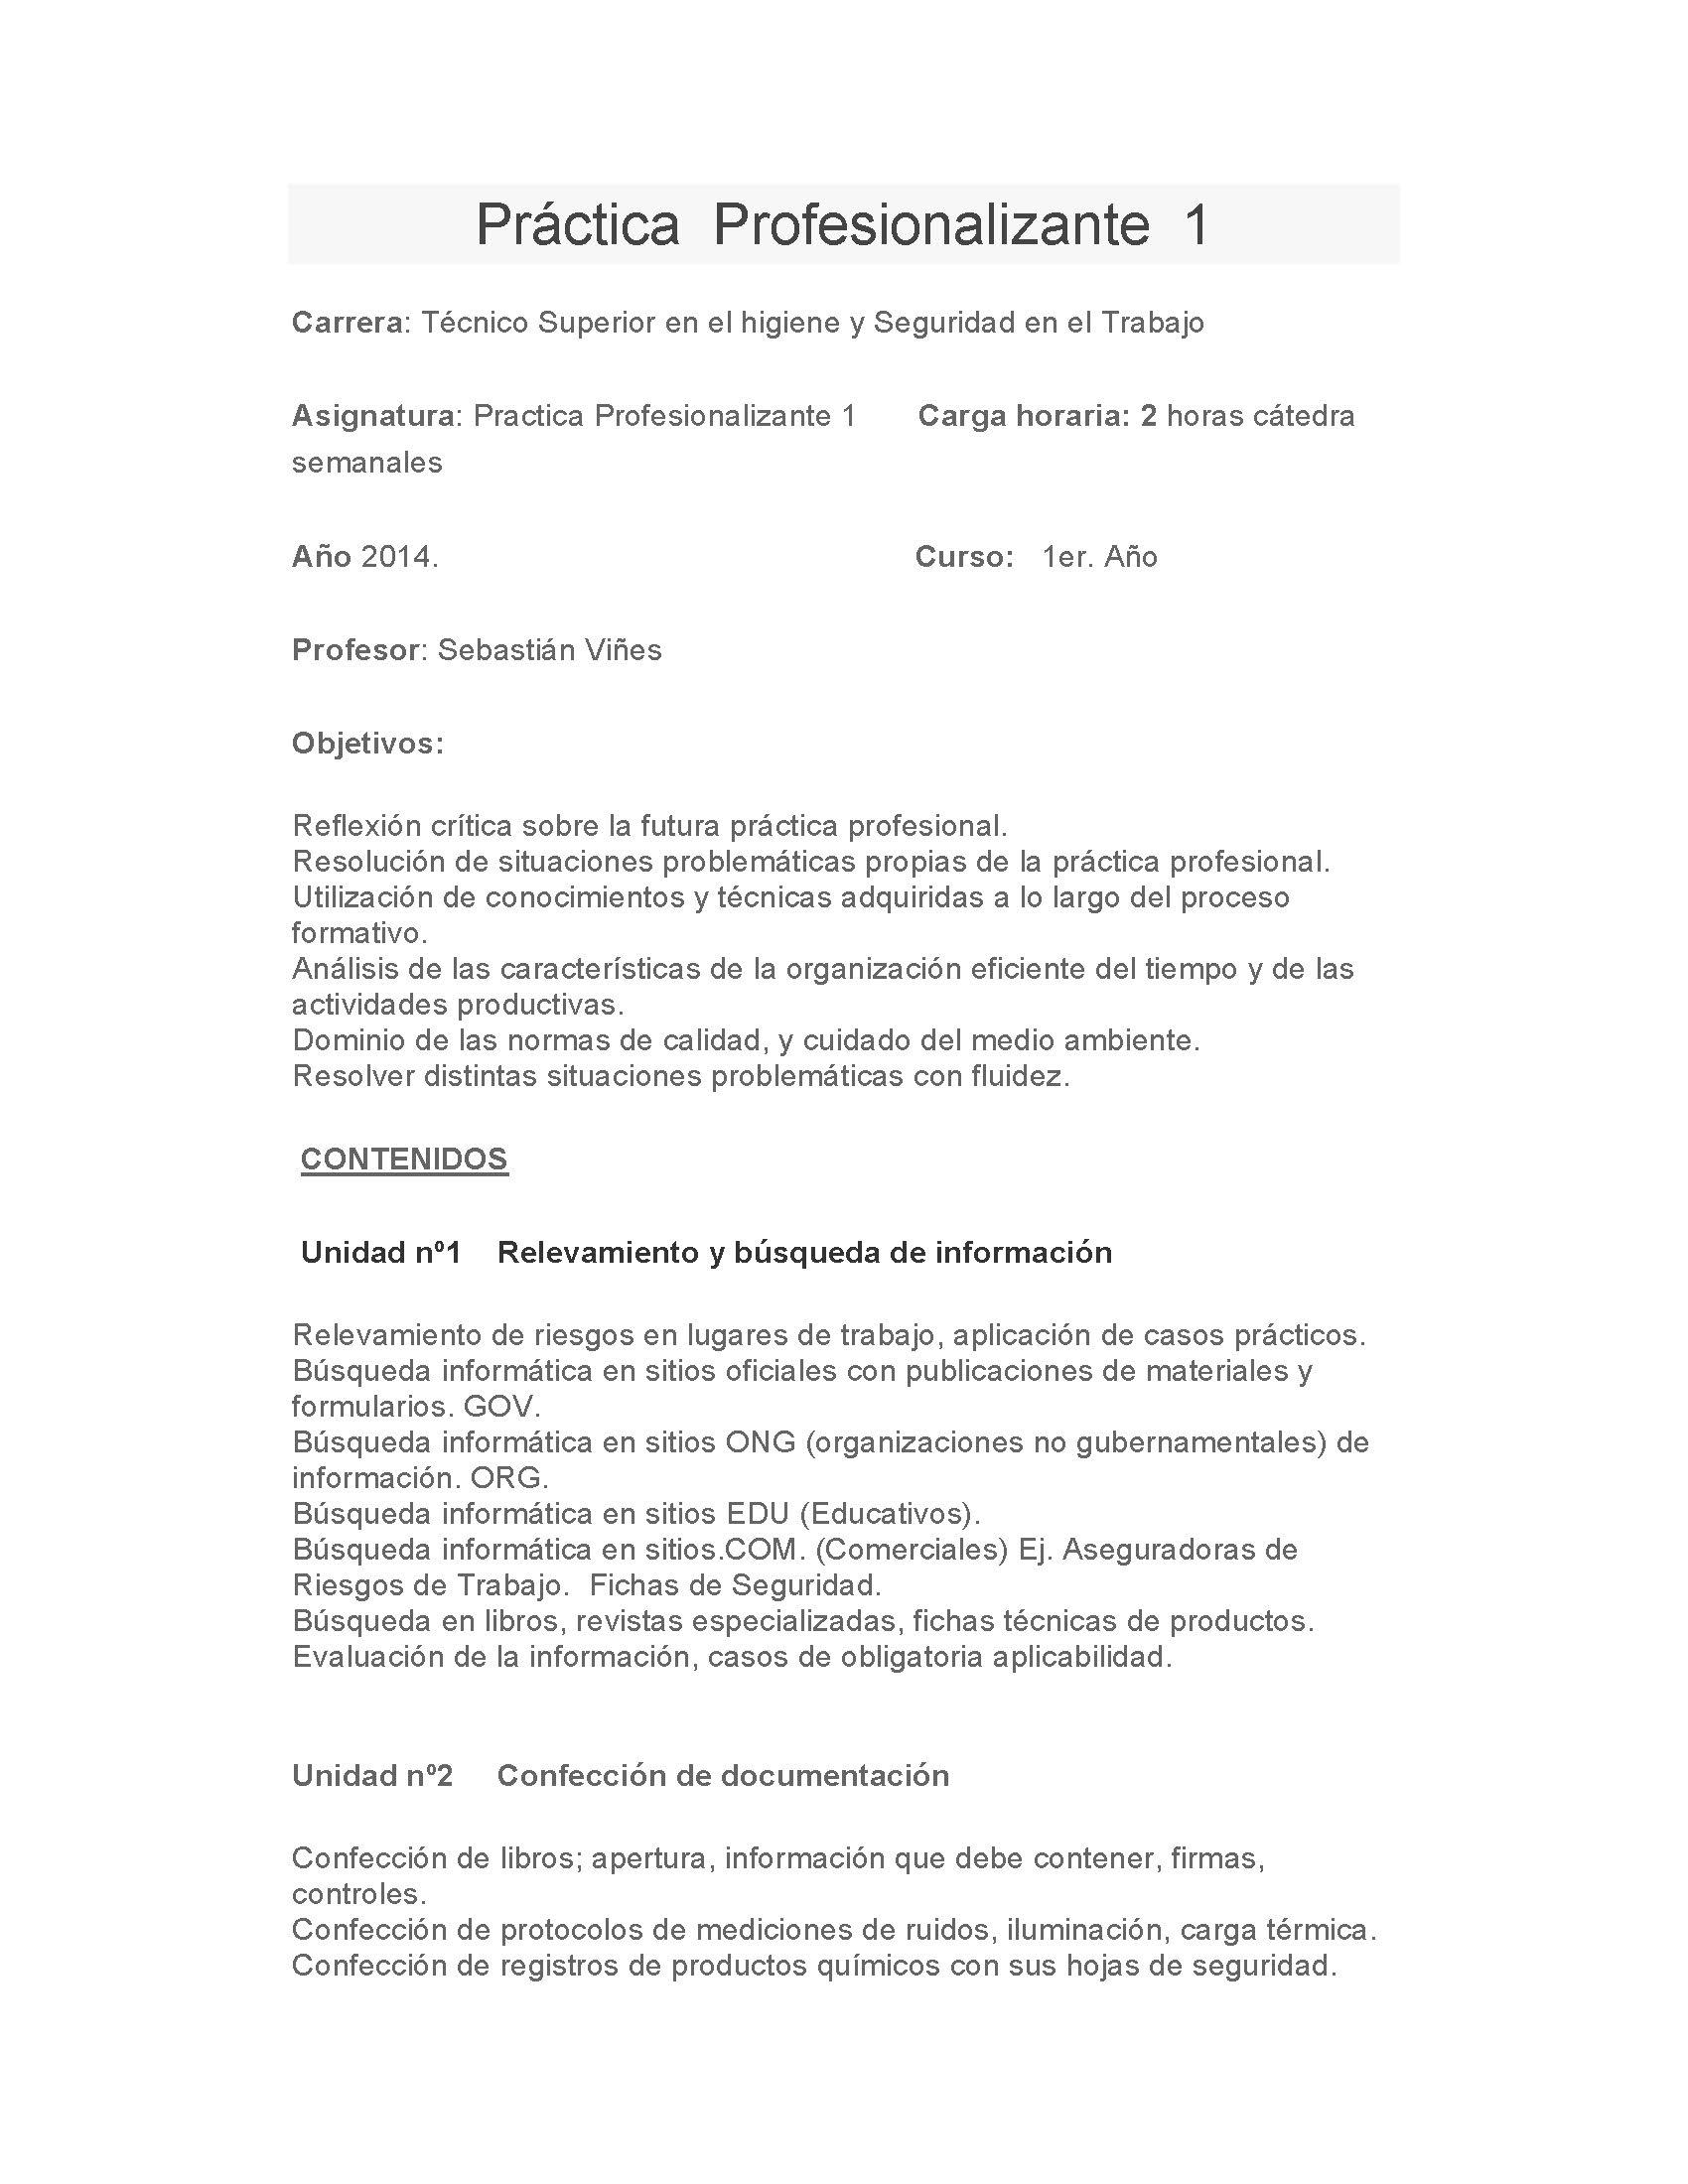 Práctica  Profesionalizante  1  Contenidos_Page_1